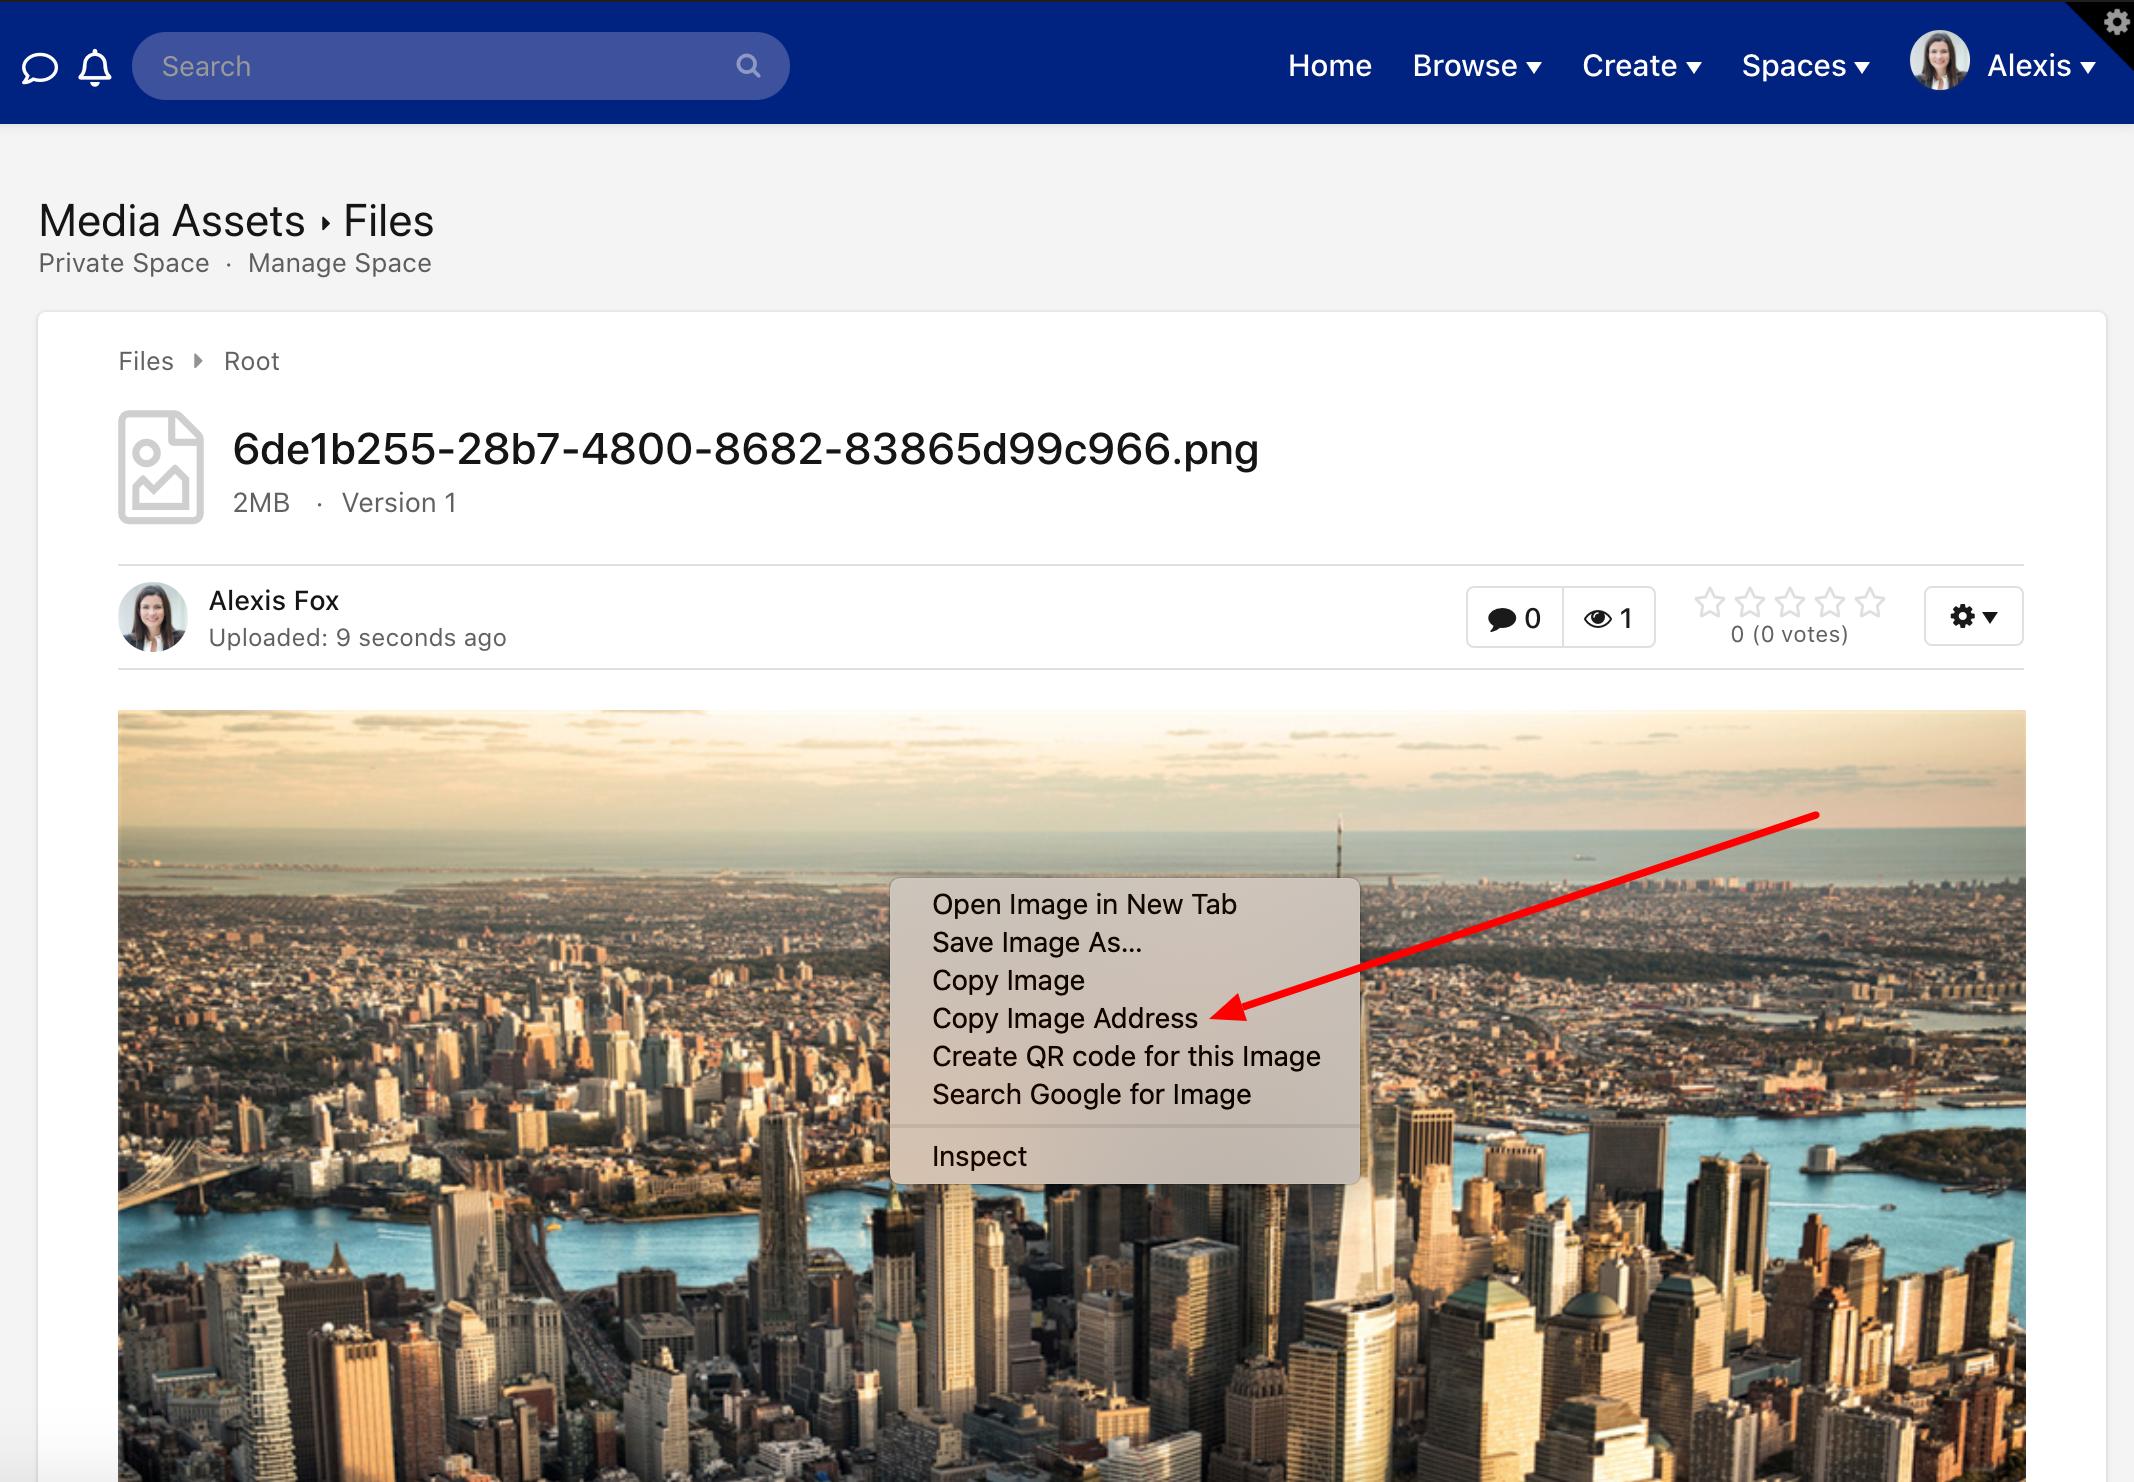 Click Copy Image Address